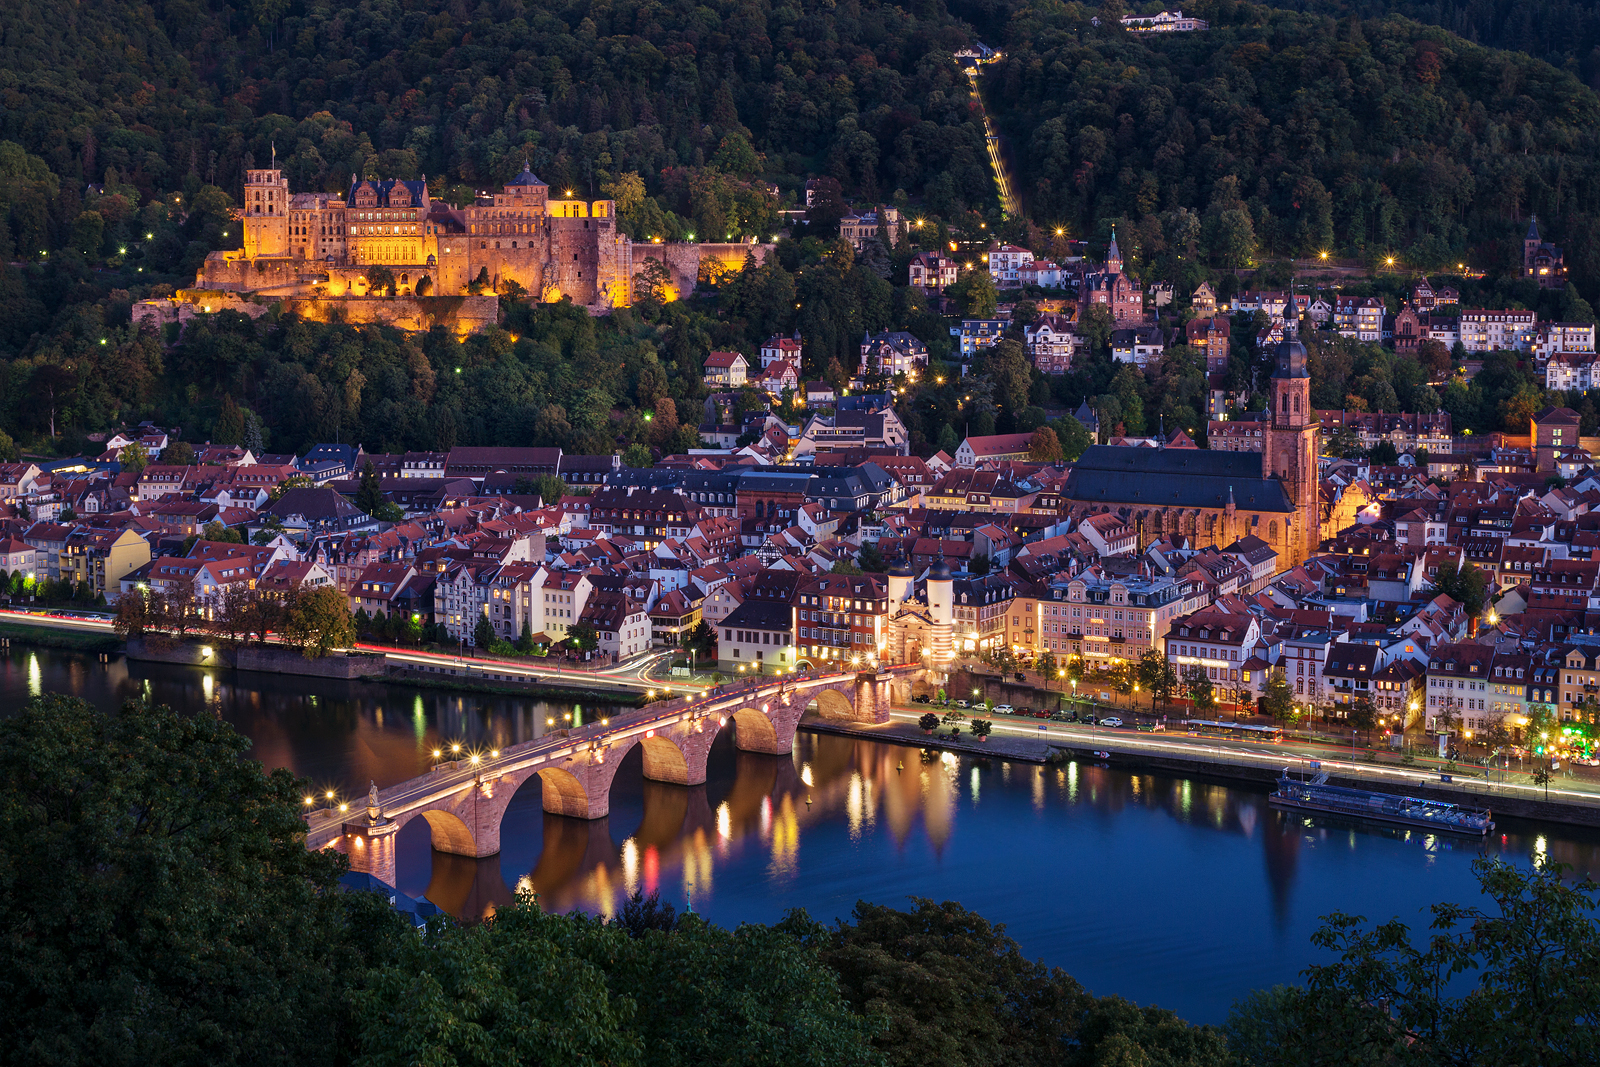 Philosophenweg, Heidelberg, Germany